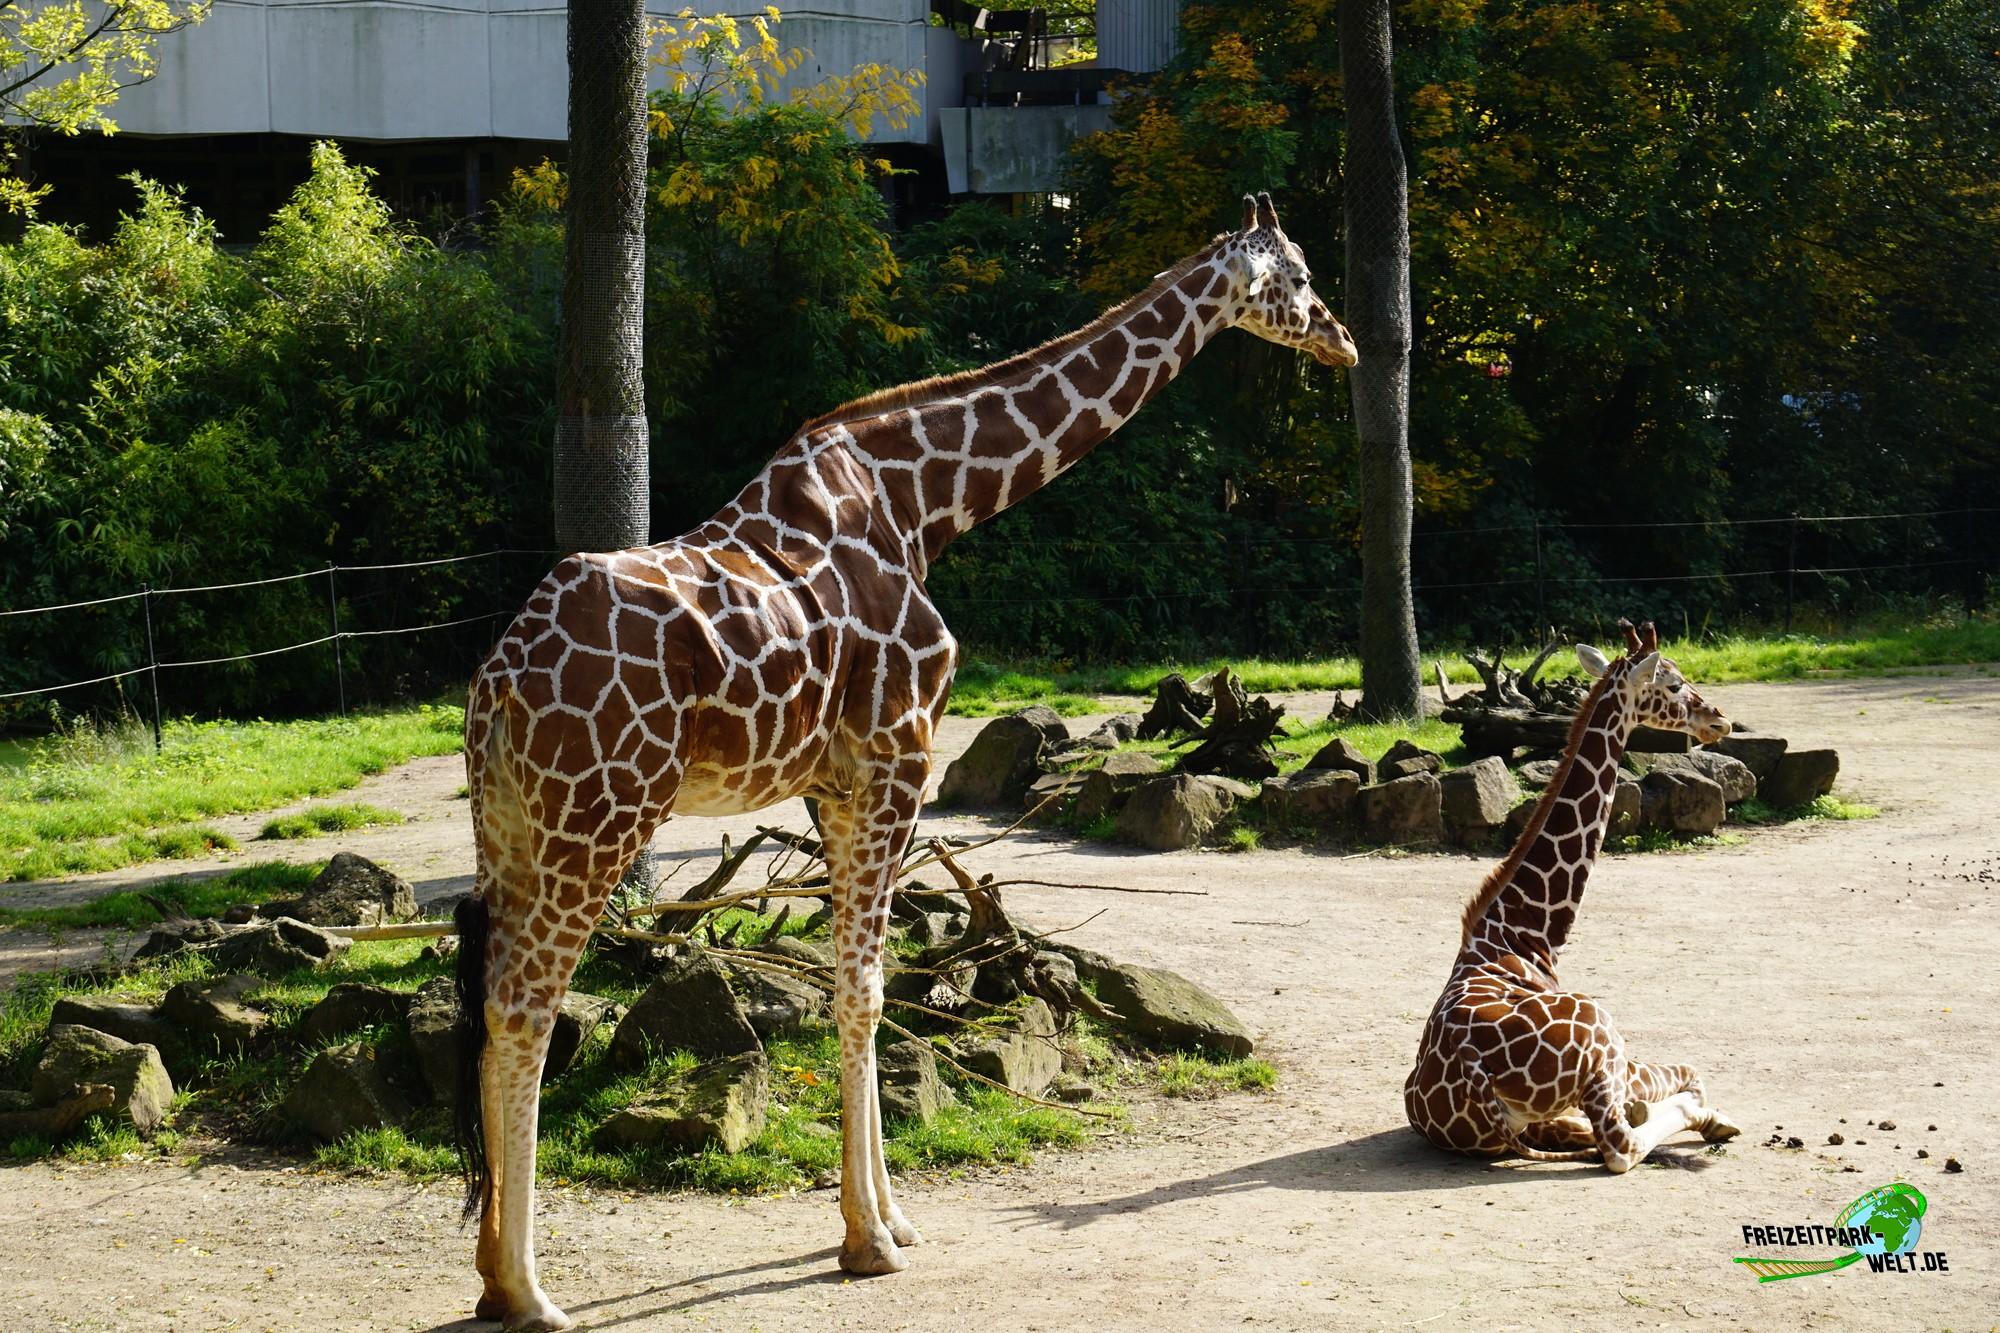 giraffen zoo duisburg freizeitpark. Black Bedroom Furniture Sets. Home Design Ideas